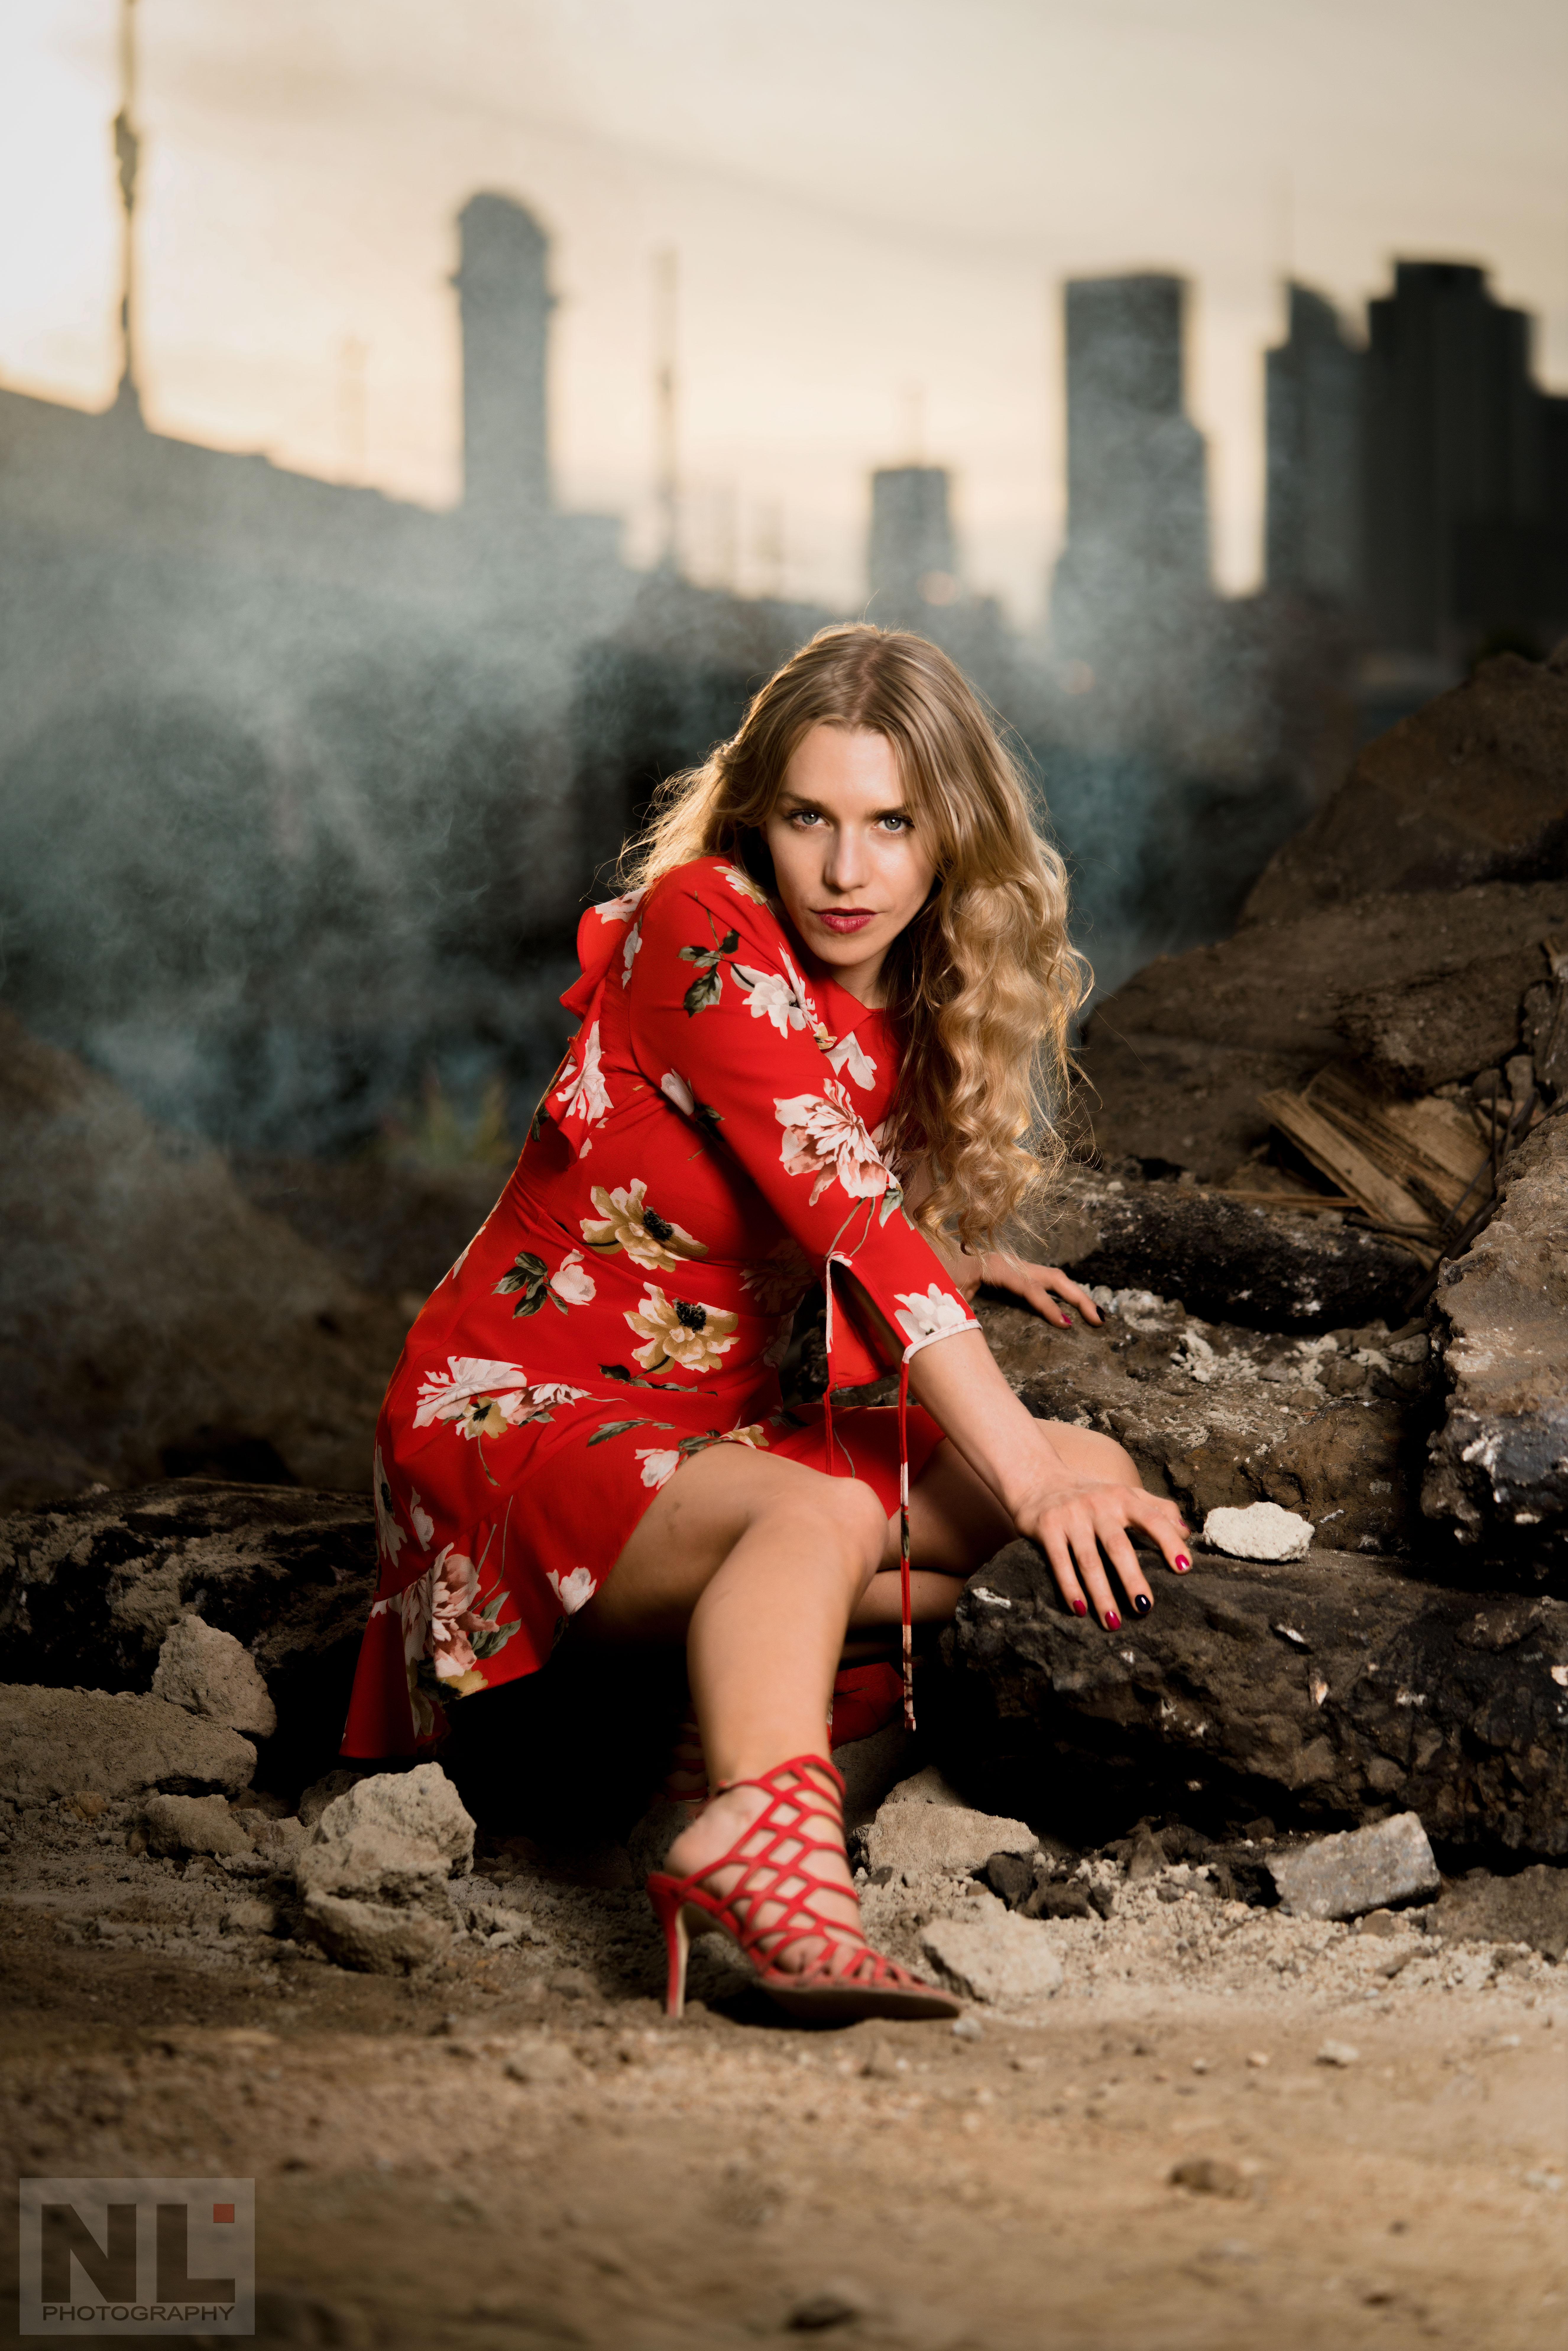 Julia Dietze nlphotography